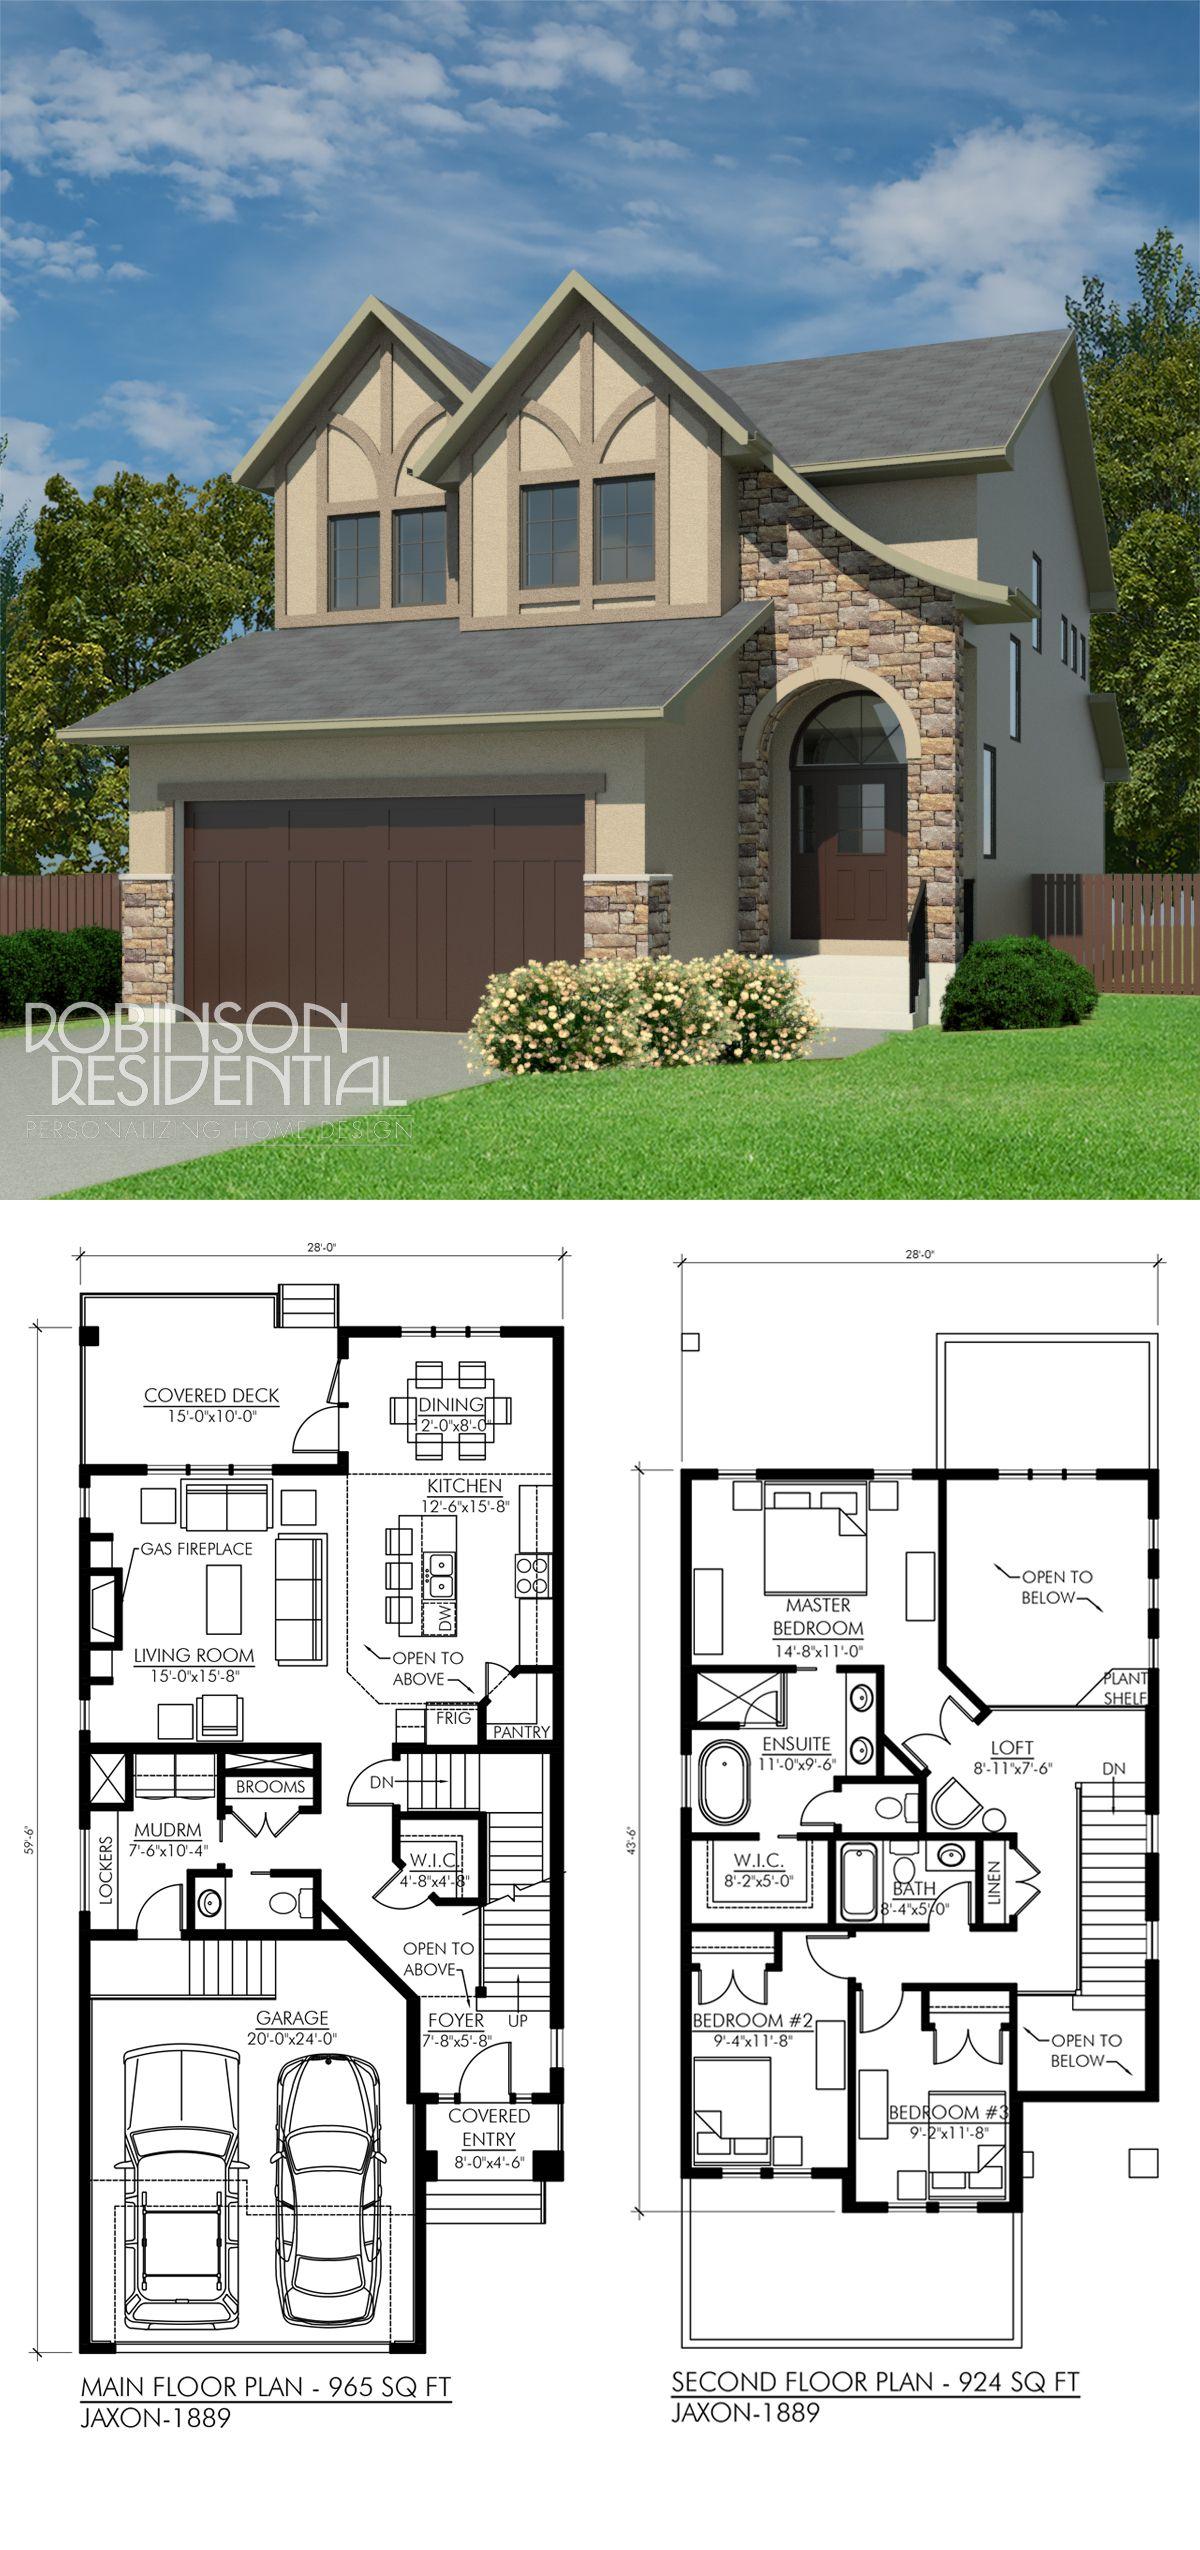 Tudor Jaxon 1889 Robinson Plans Sims House Plans House Layouts House Blueprints